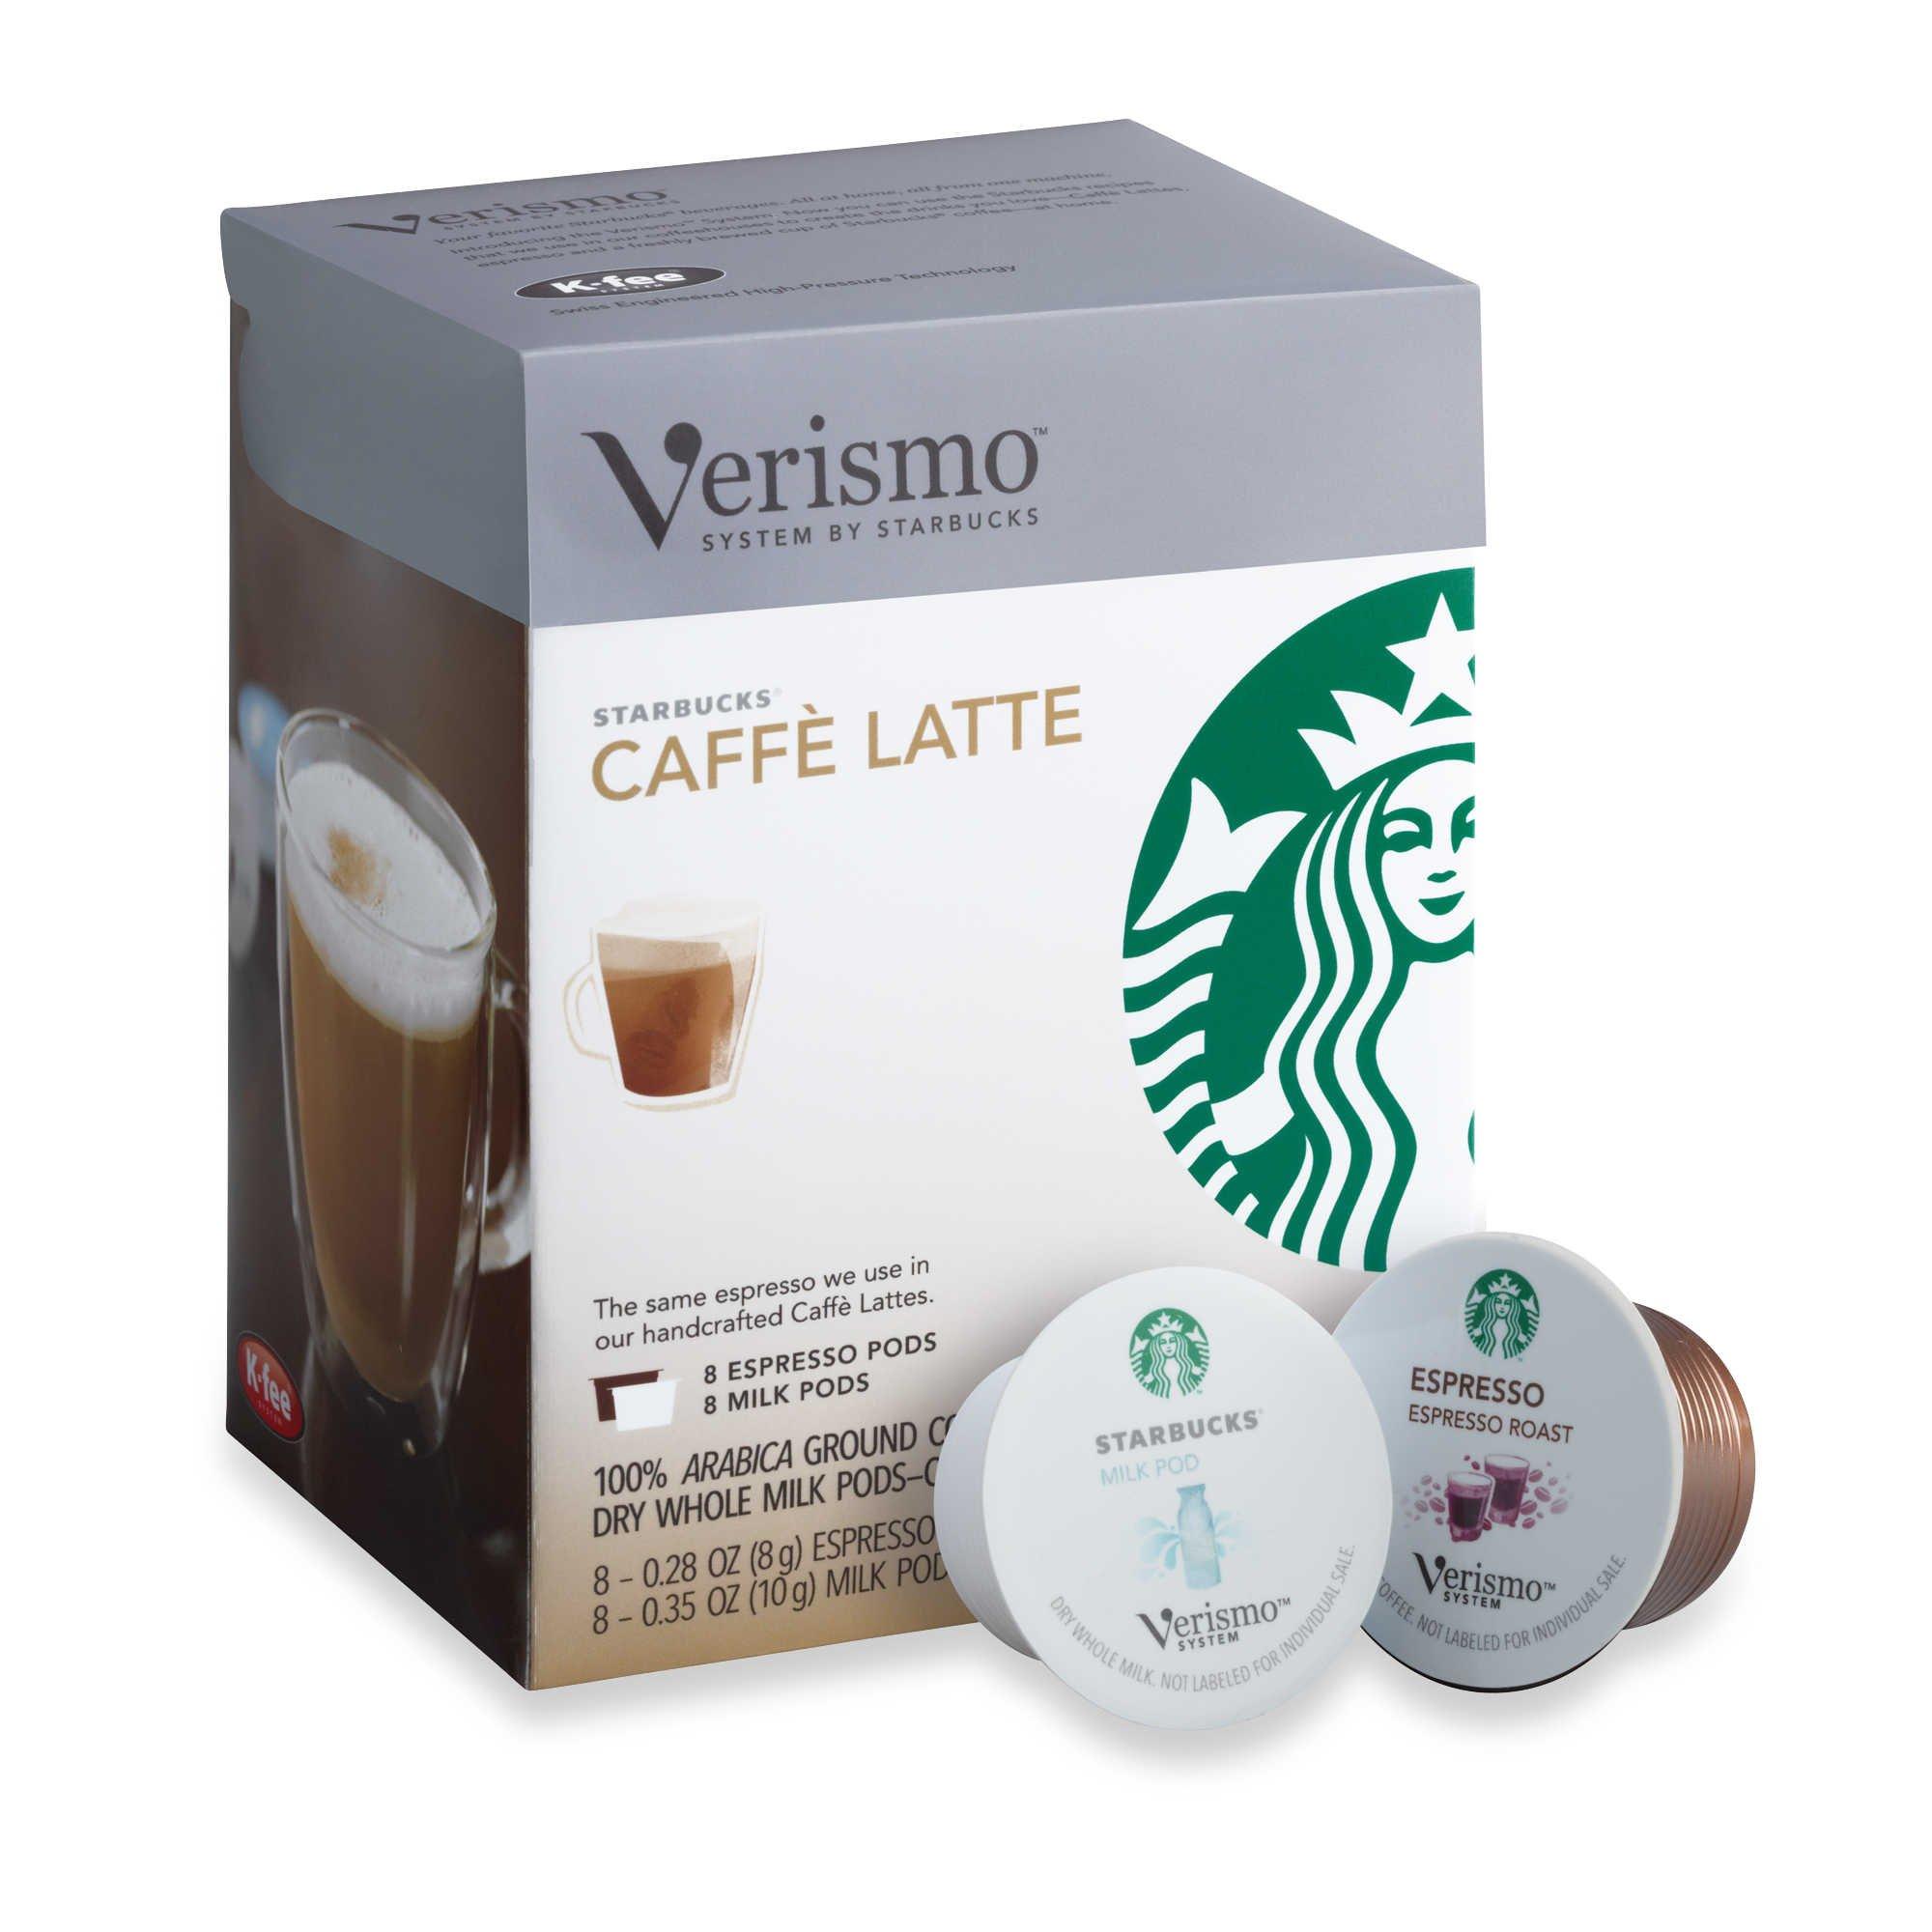 Starbucks Verismo Caffe Latte Pods